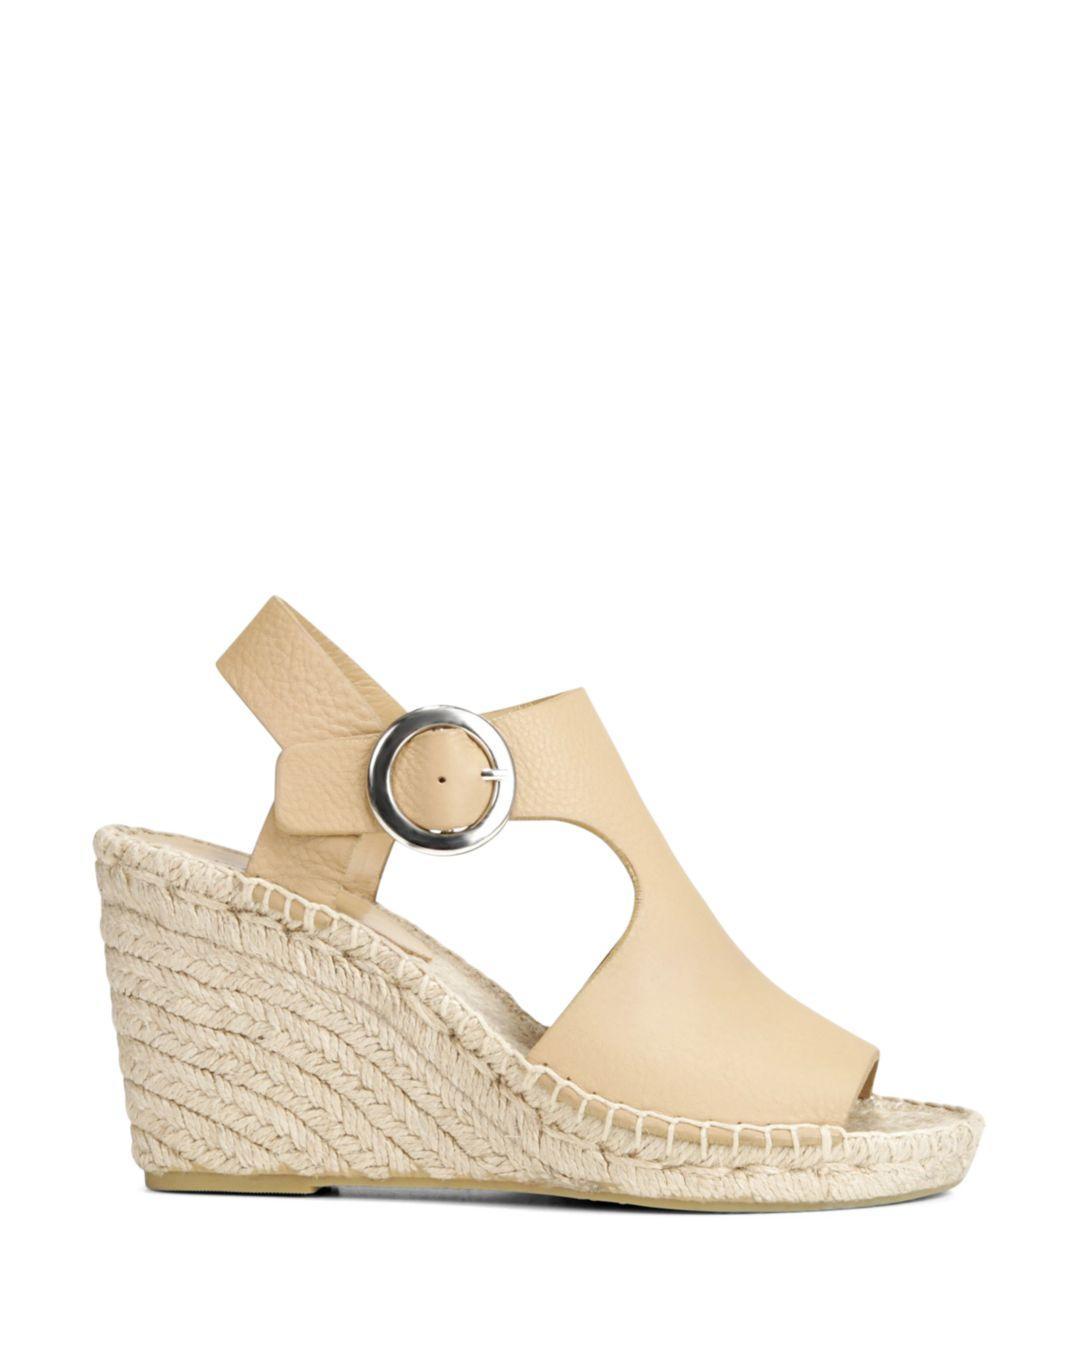 7981db228a31 Via Spiga Women s Nolan Espadrille Wedge Heel Sandals in Natural - Lyst